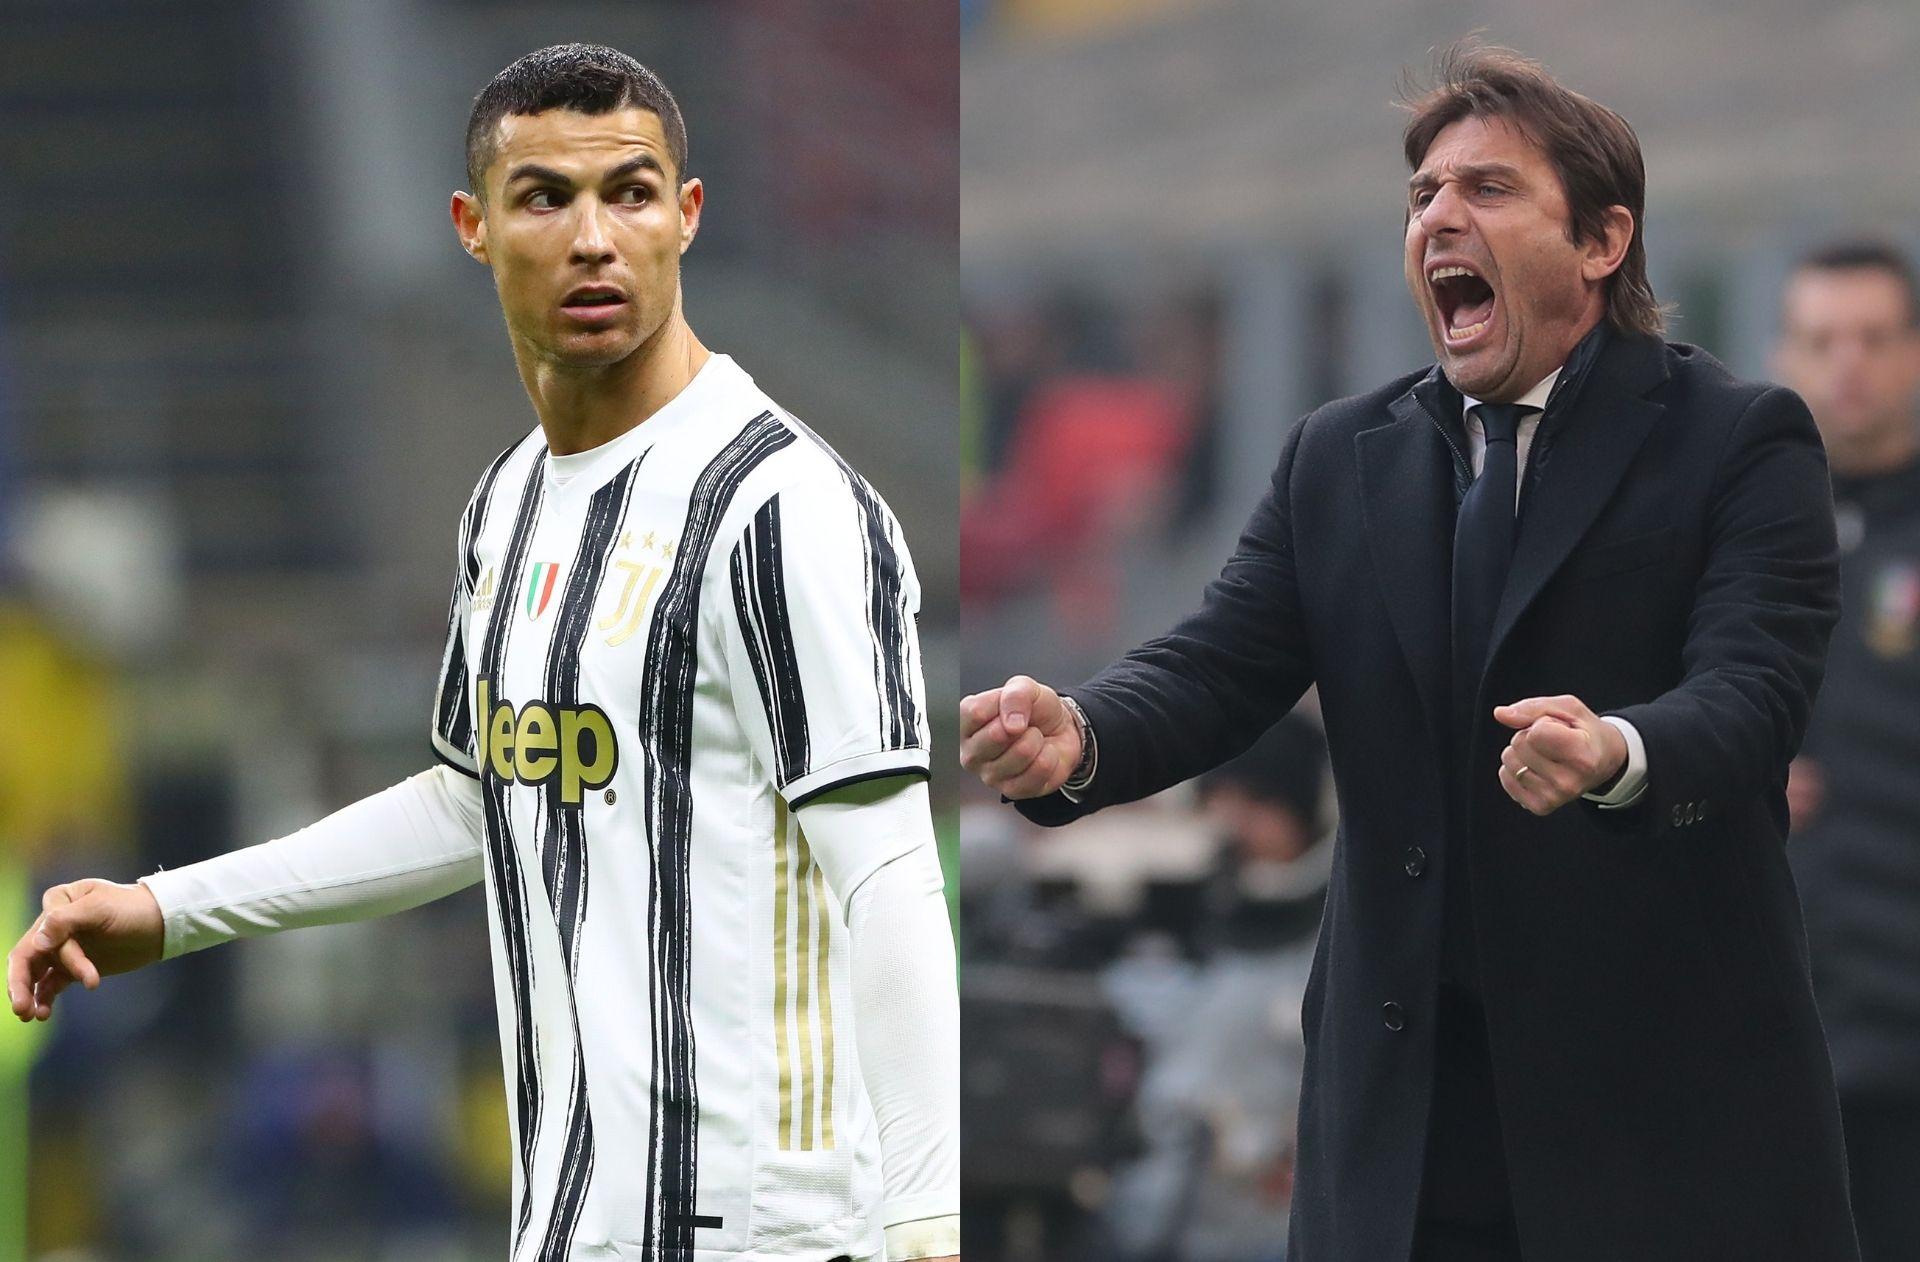 Cristiano Ronaldo of Juventus, Antonio Conte of Inter Milan